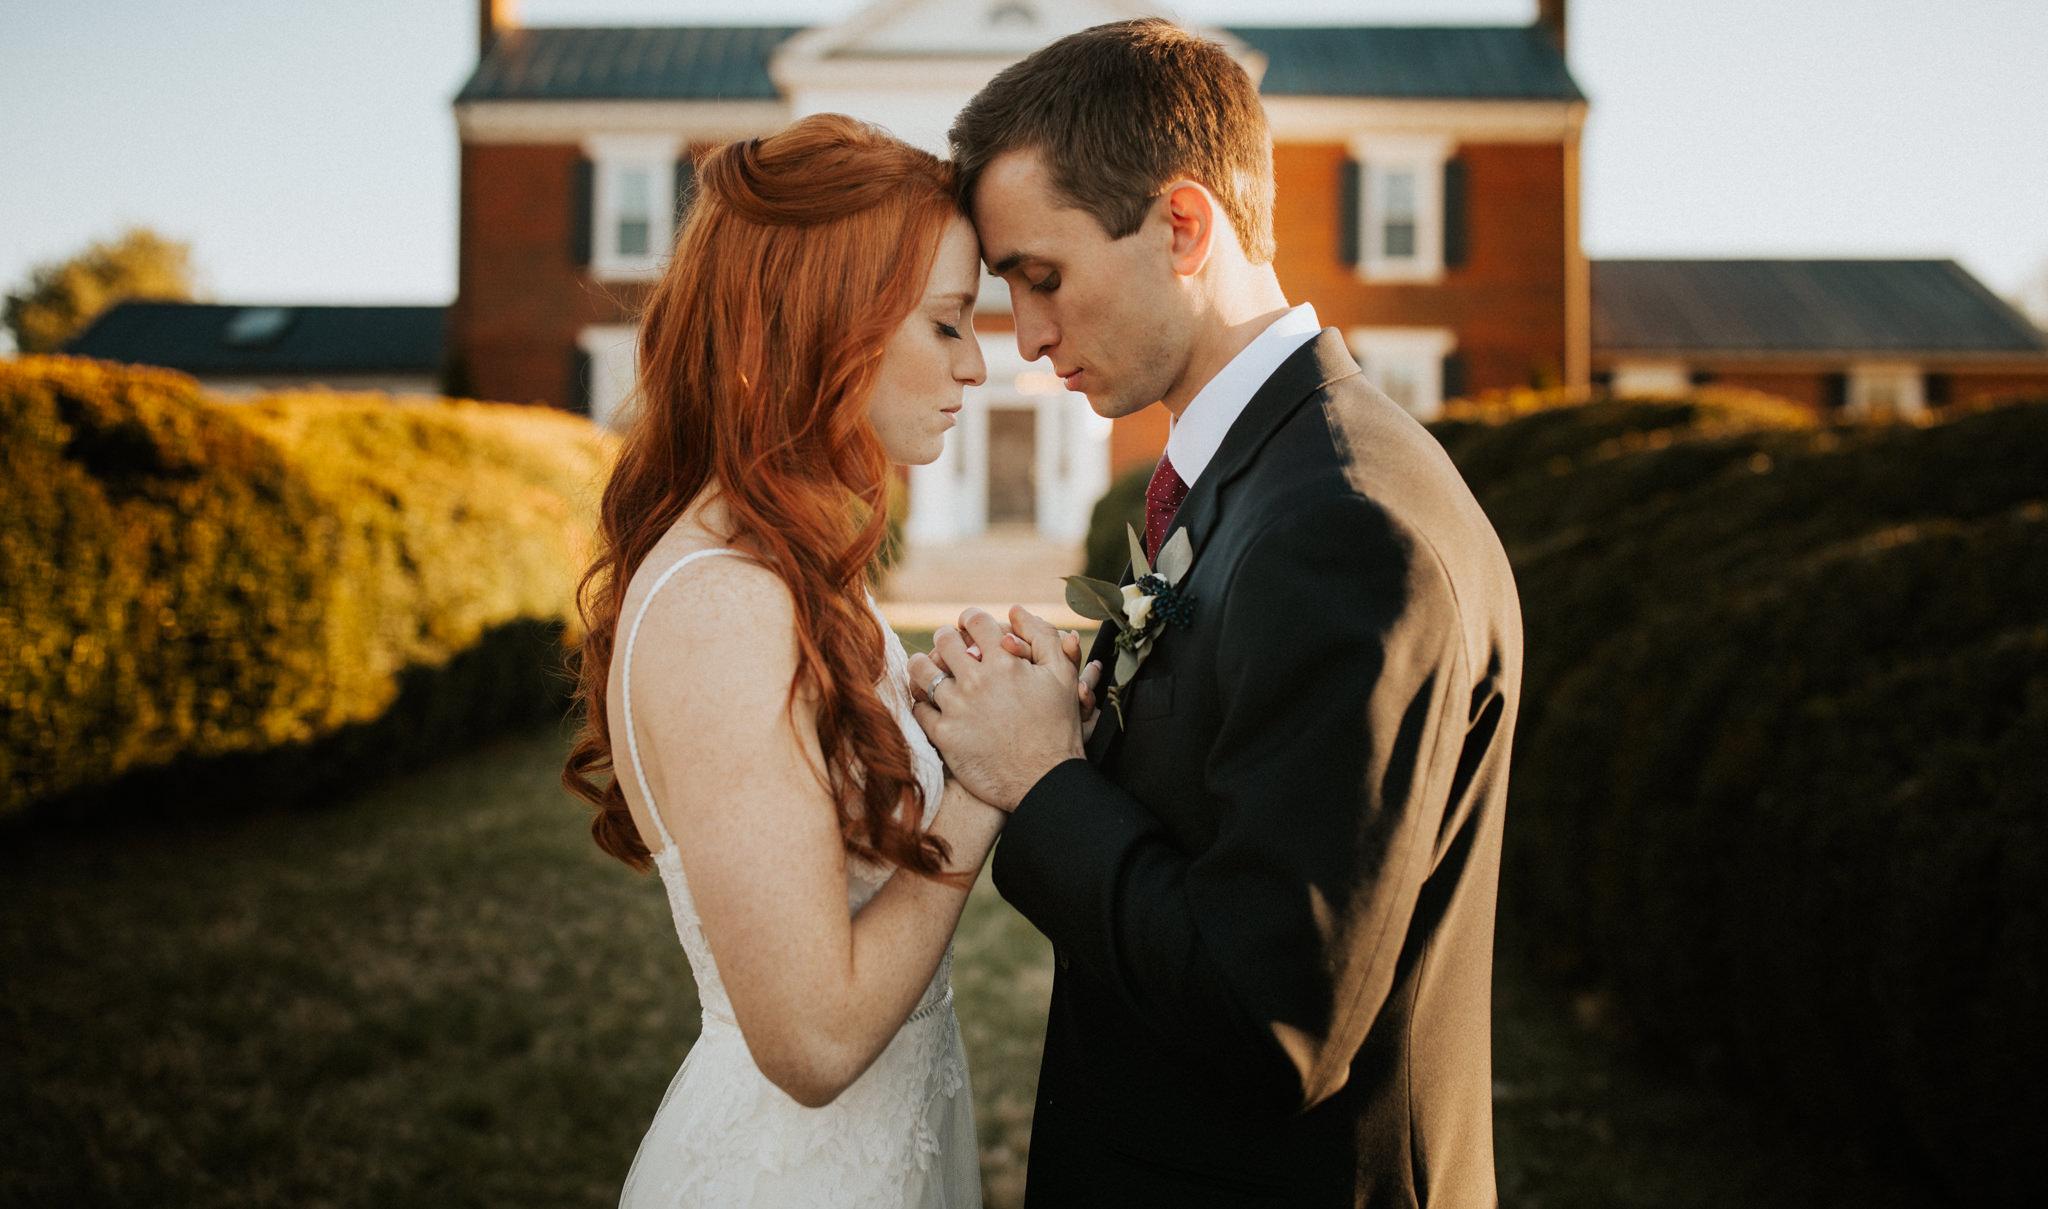 West Manor Estate Weddings - Pat Cori Photography.jpg